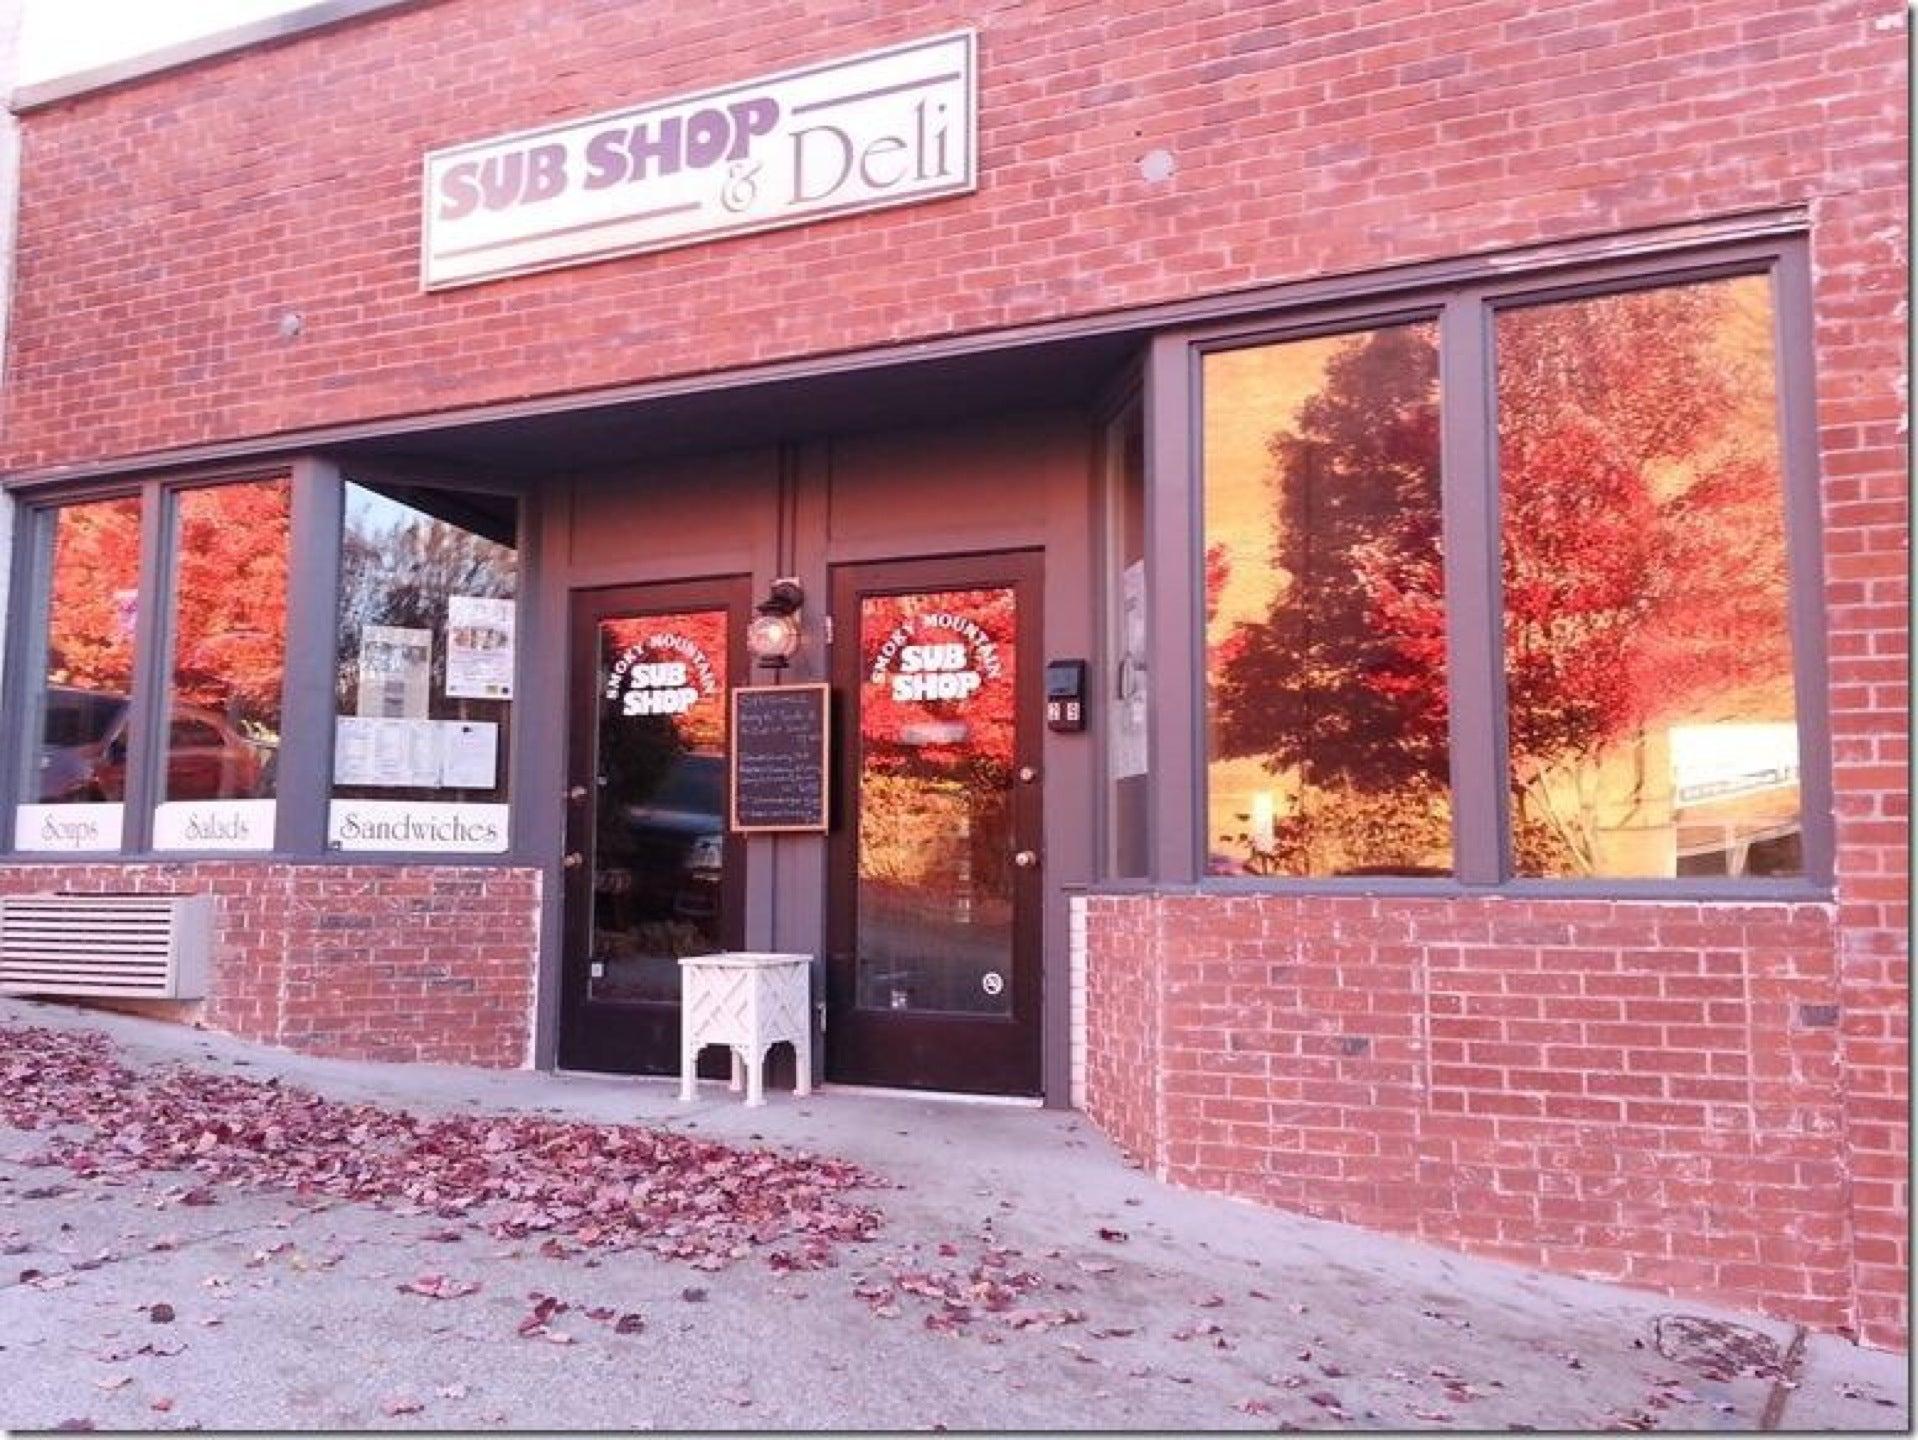 Smokey Mountain Sub Shop,